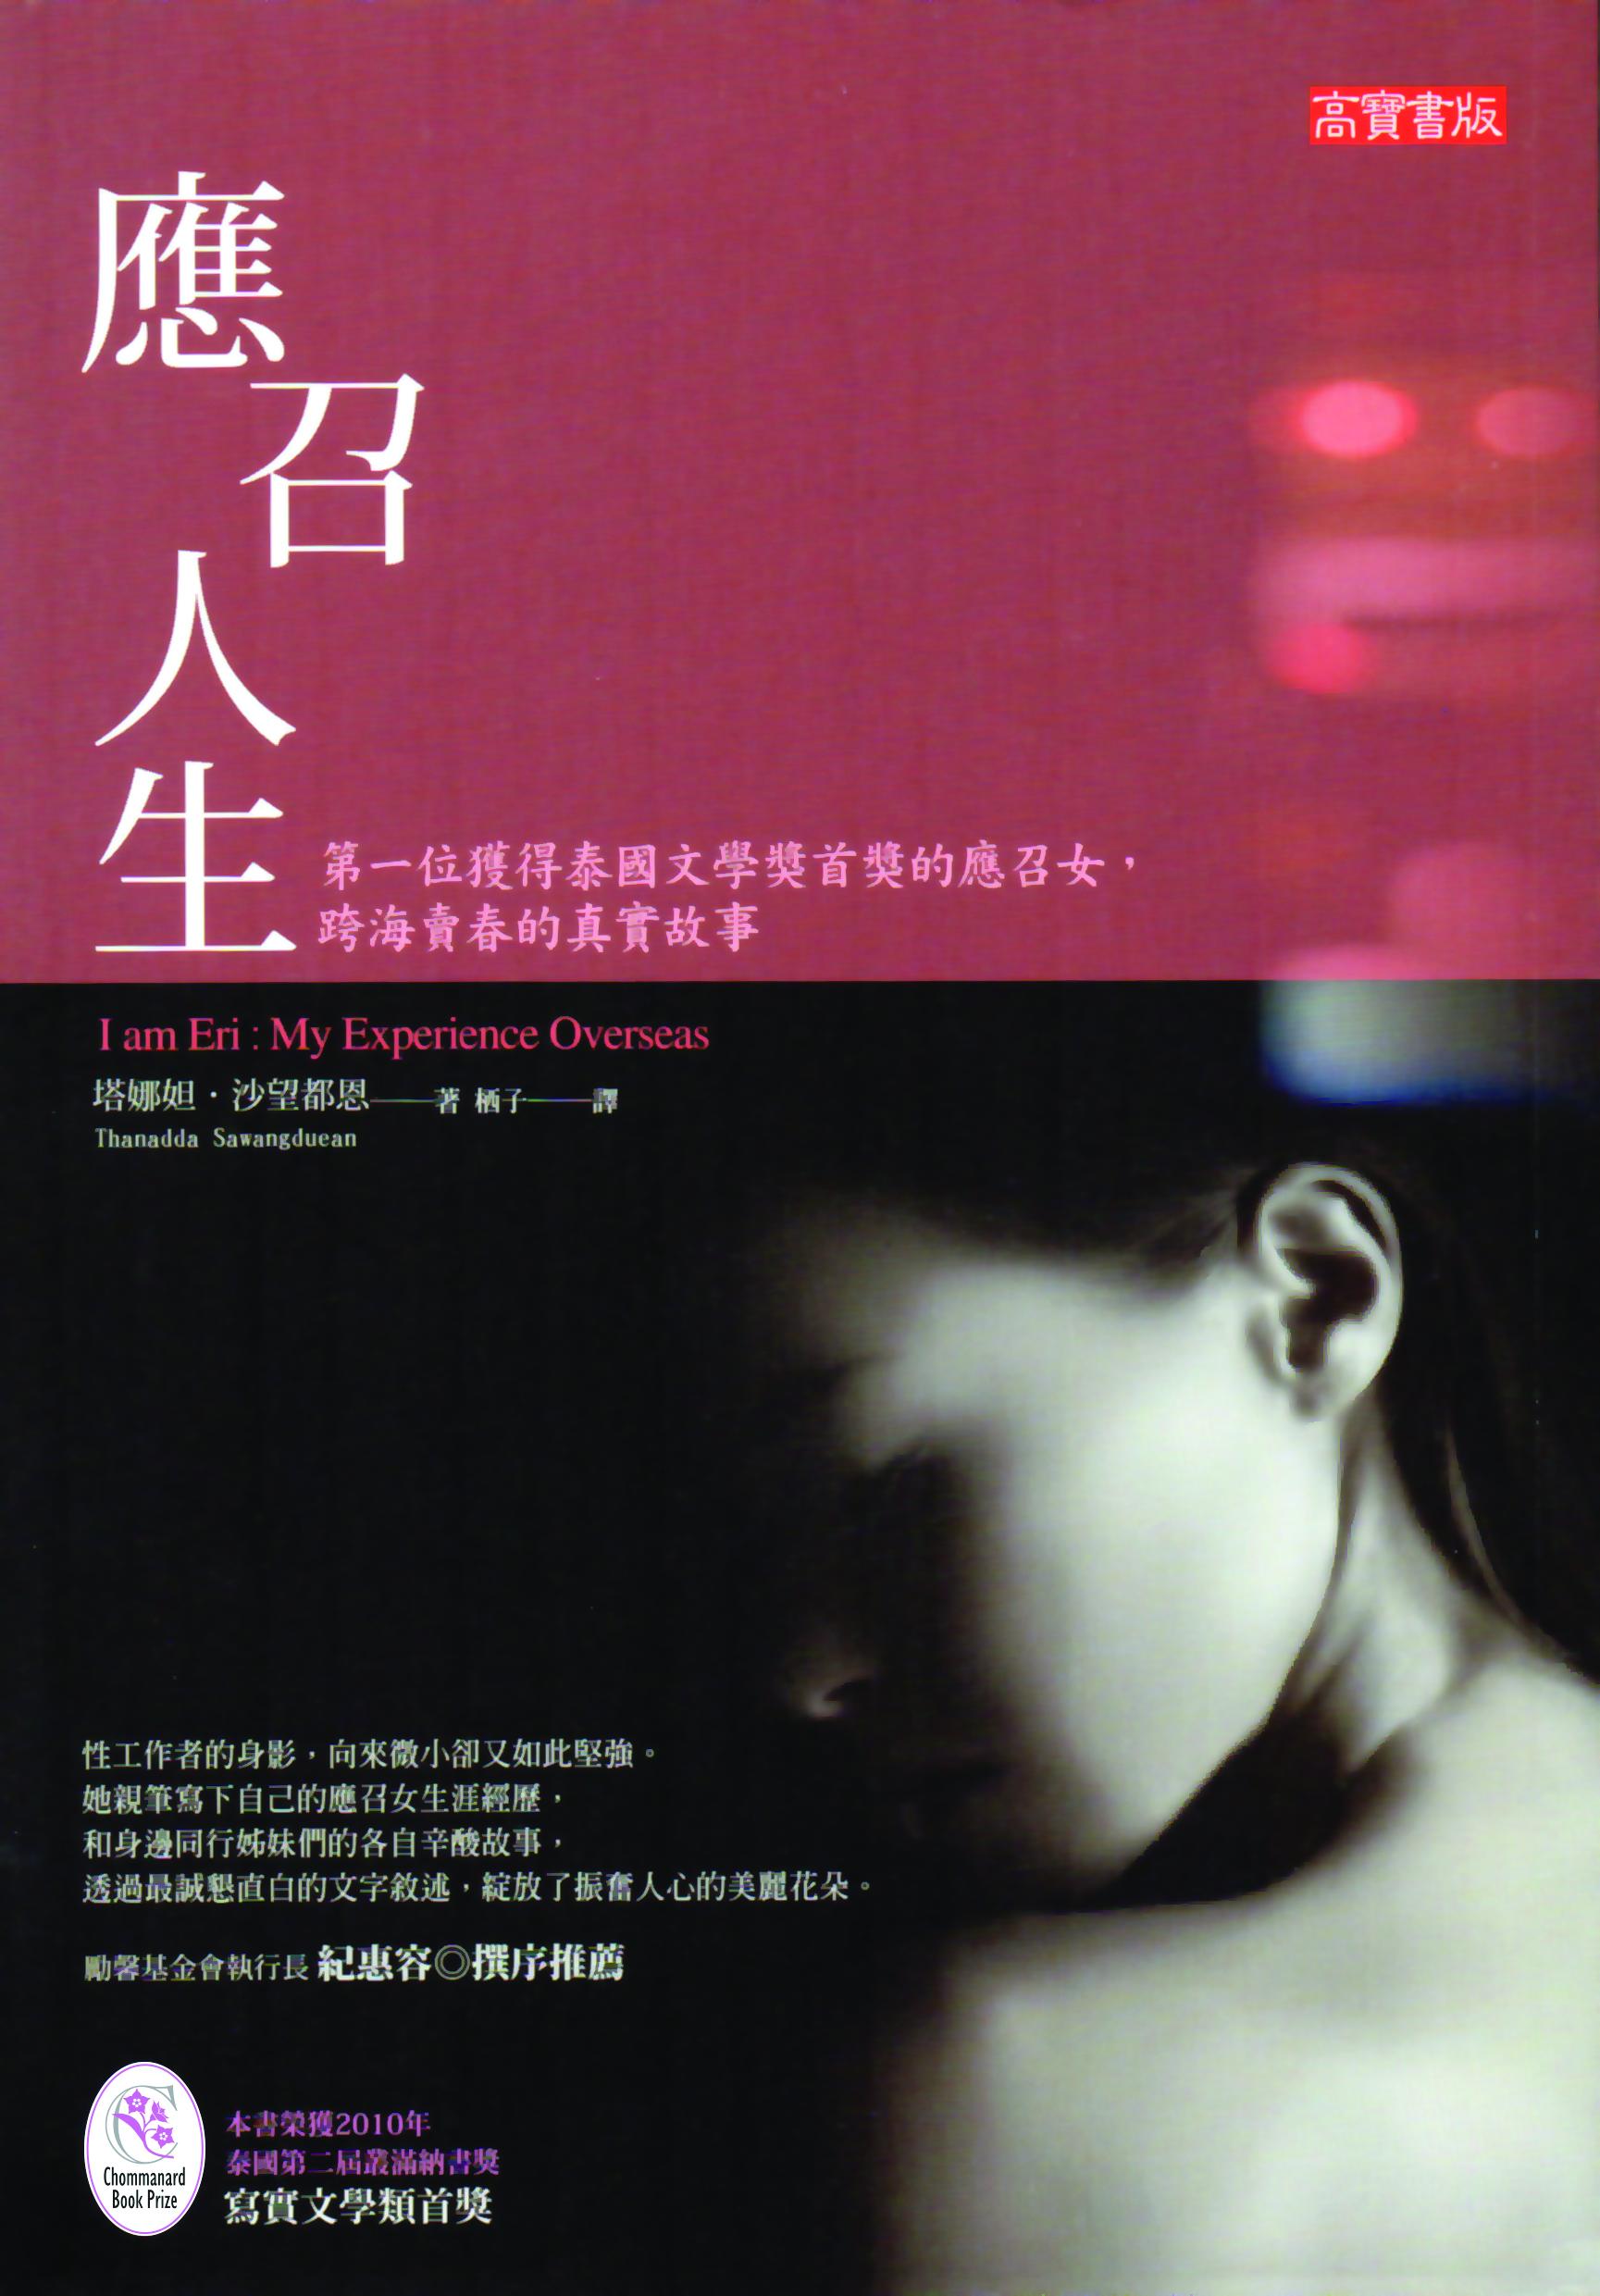 I am Eri: My Experience Overseas (Taiwanese)